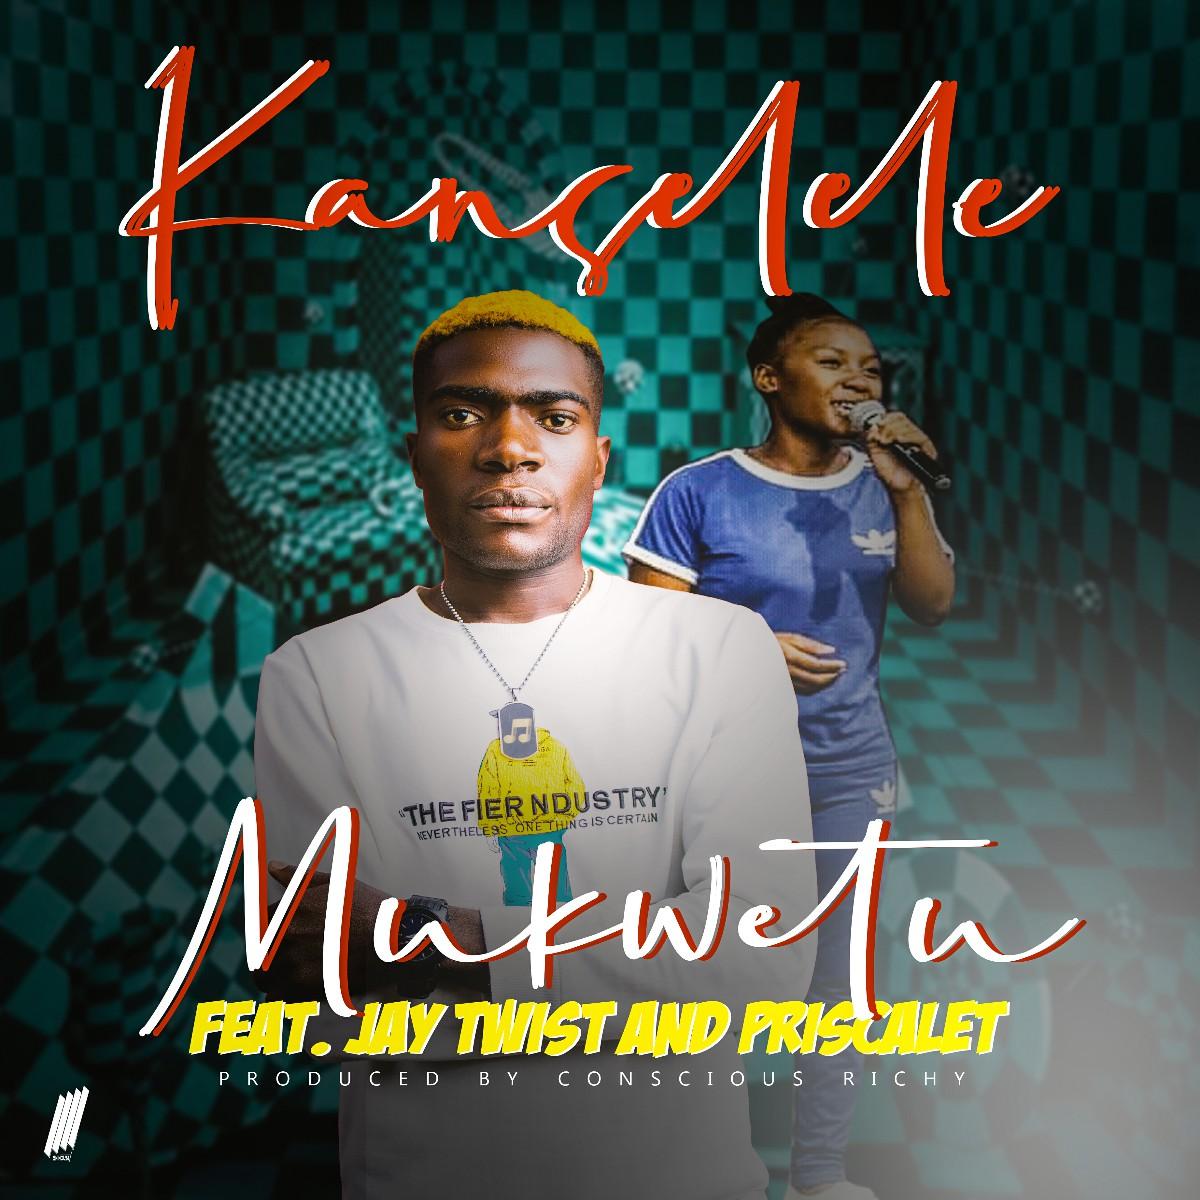 Mukwetu ft. Jay Twist & Priscarlet - Kanselele